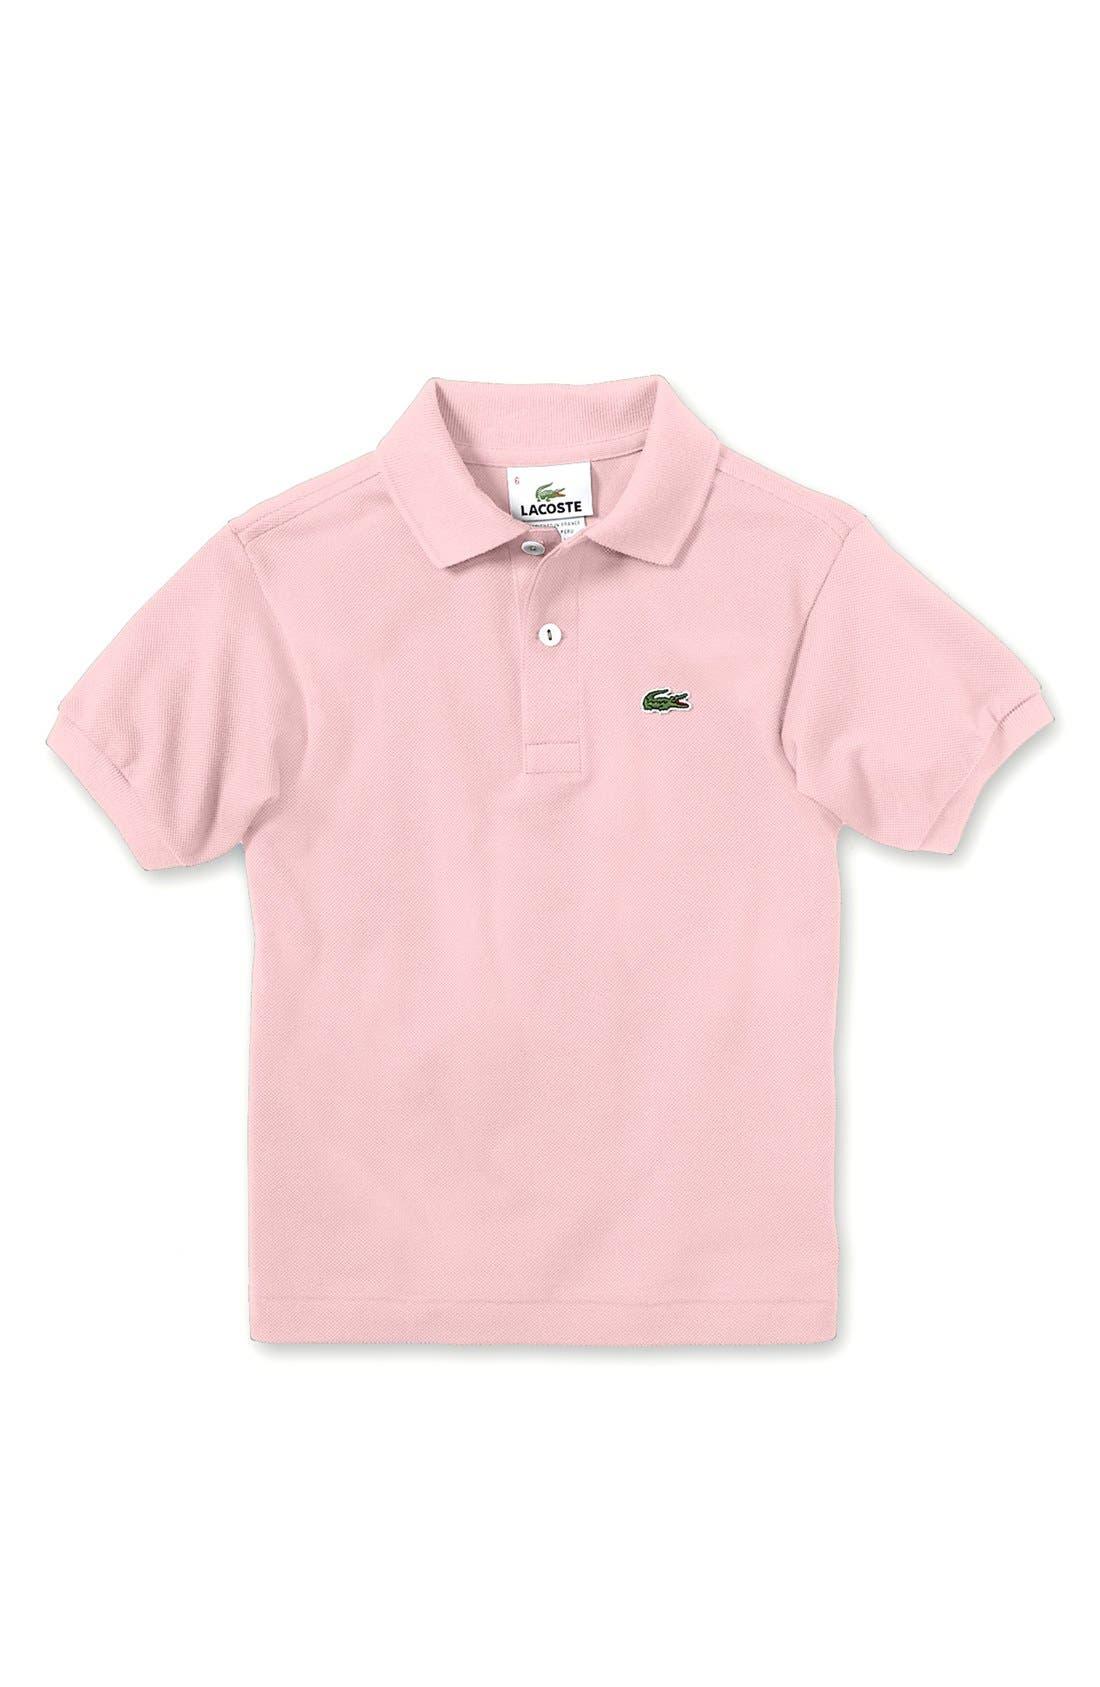 Alternate Image 1 Selected - Lacoste Short Sleeve Polo (Baby Boys)